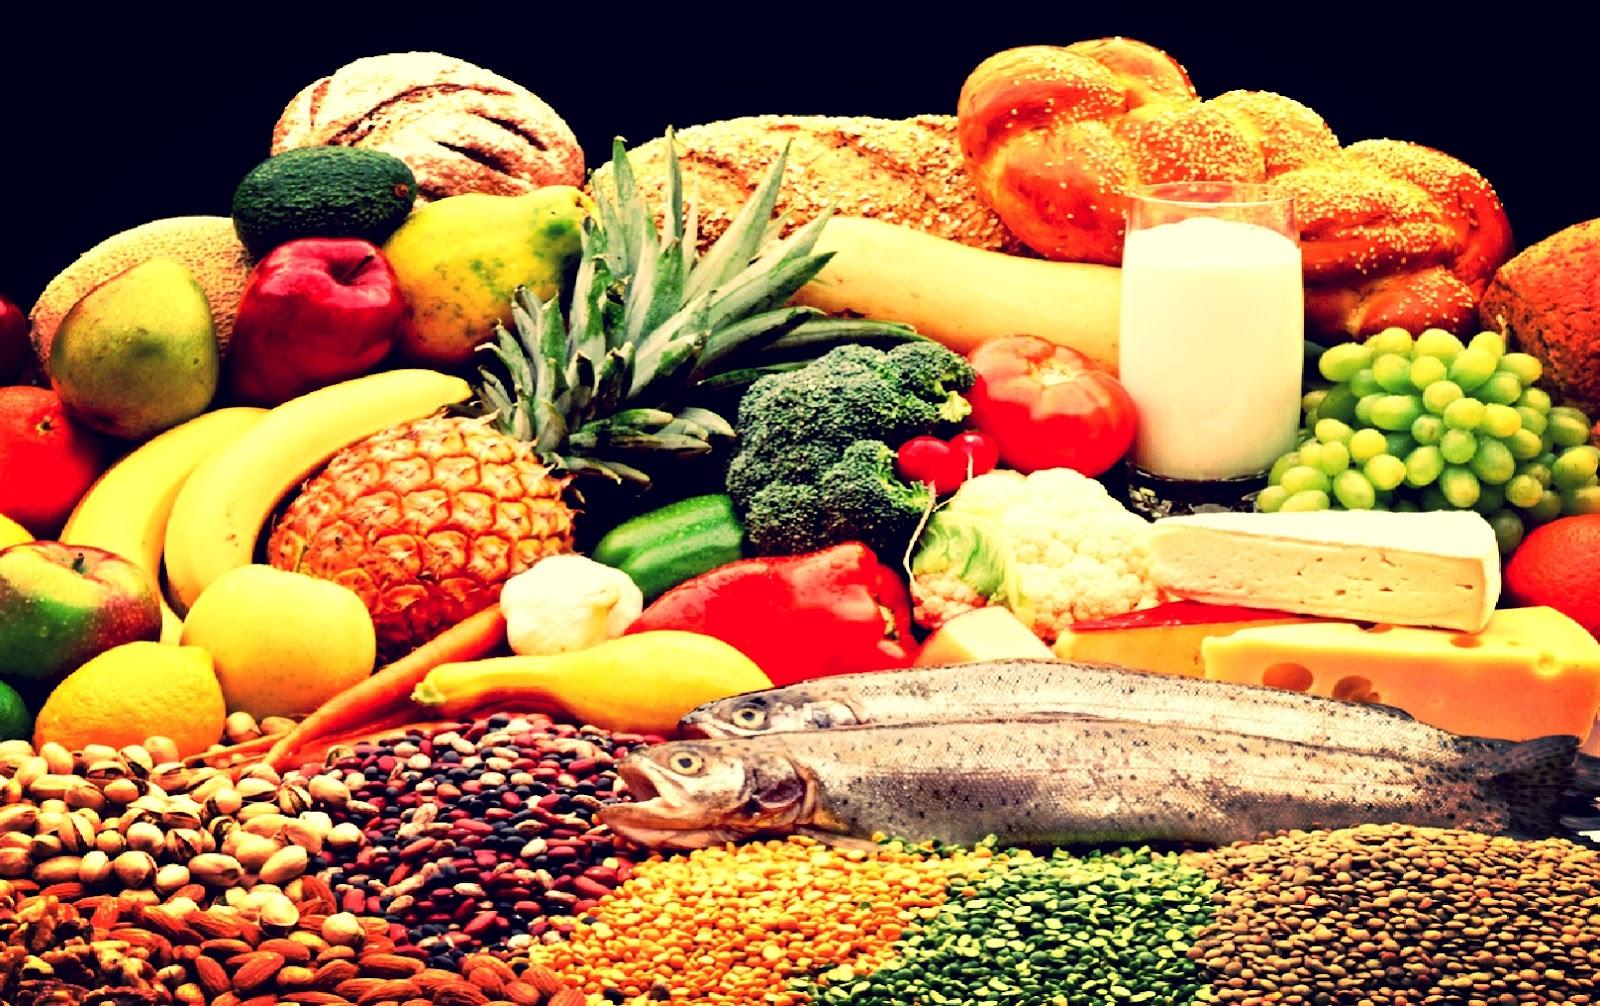 balanced-diet_21347558674_o.jpg